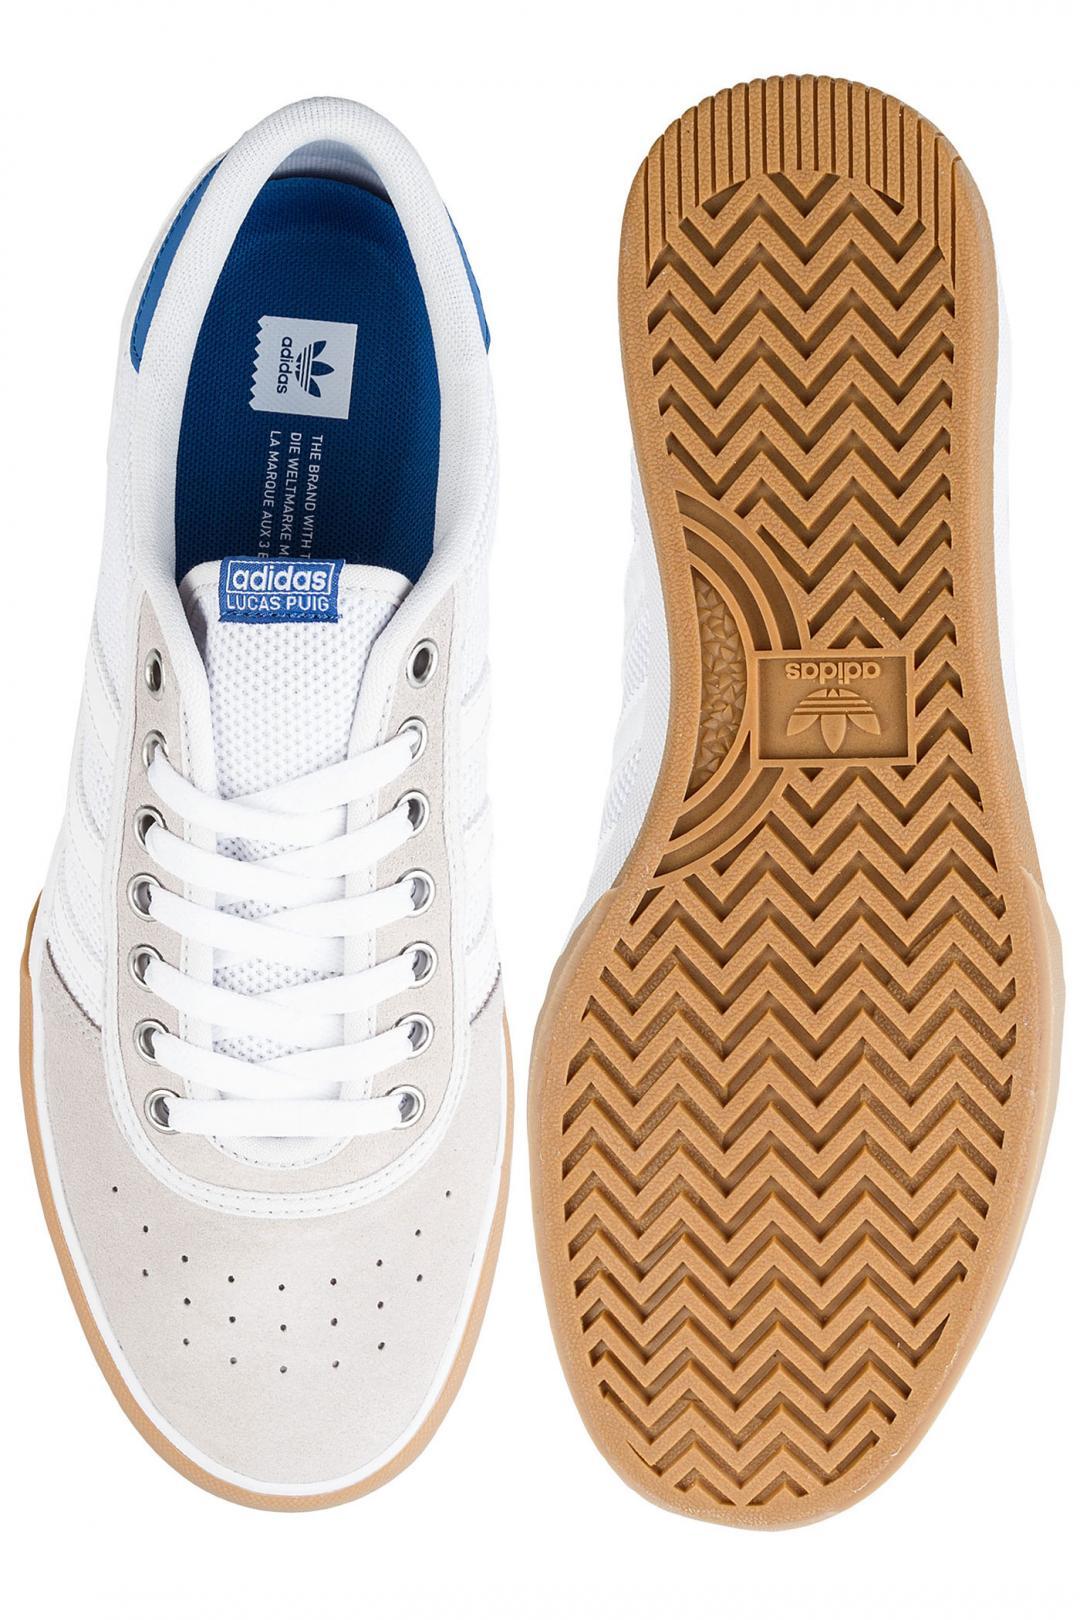 Uomo adidas Skateboarding Lucas Premiere white royal gum   Sneakers low top